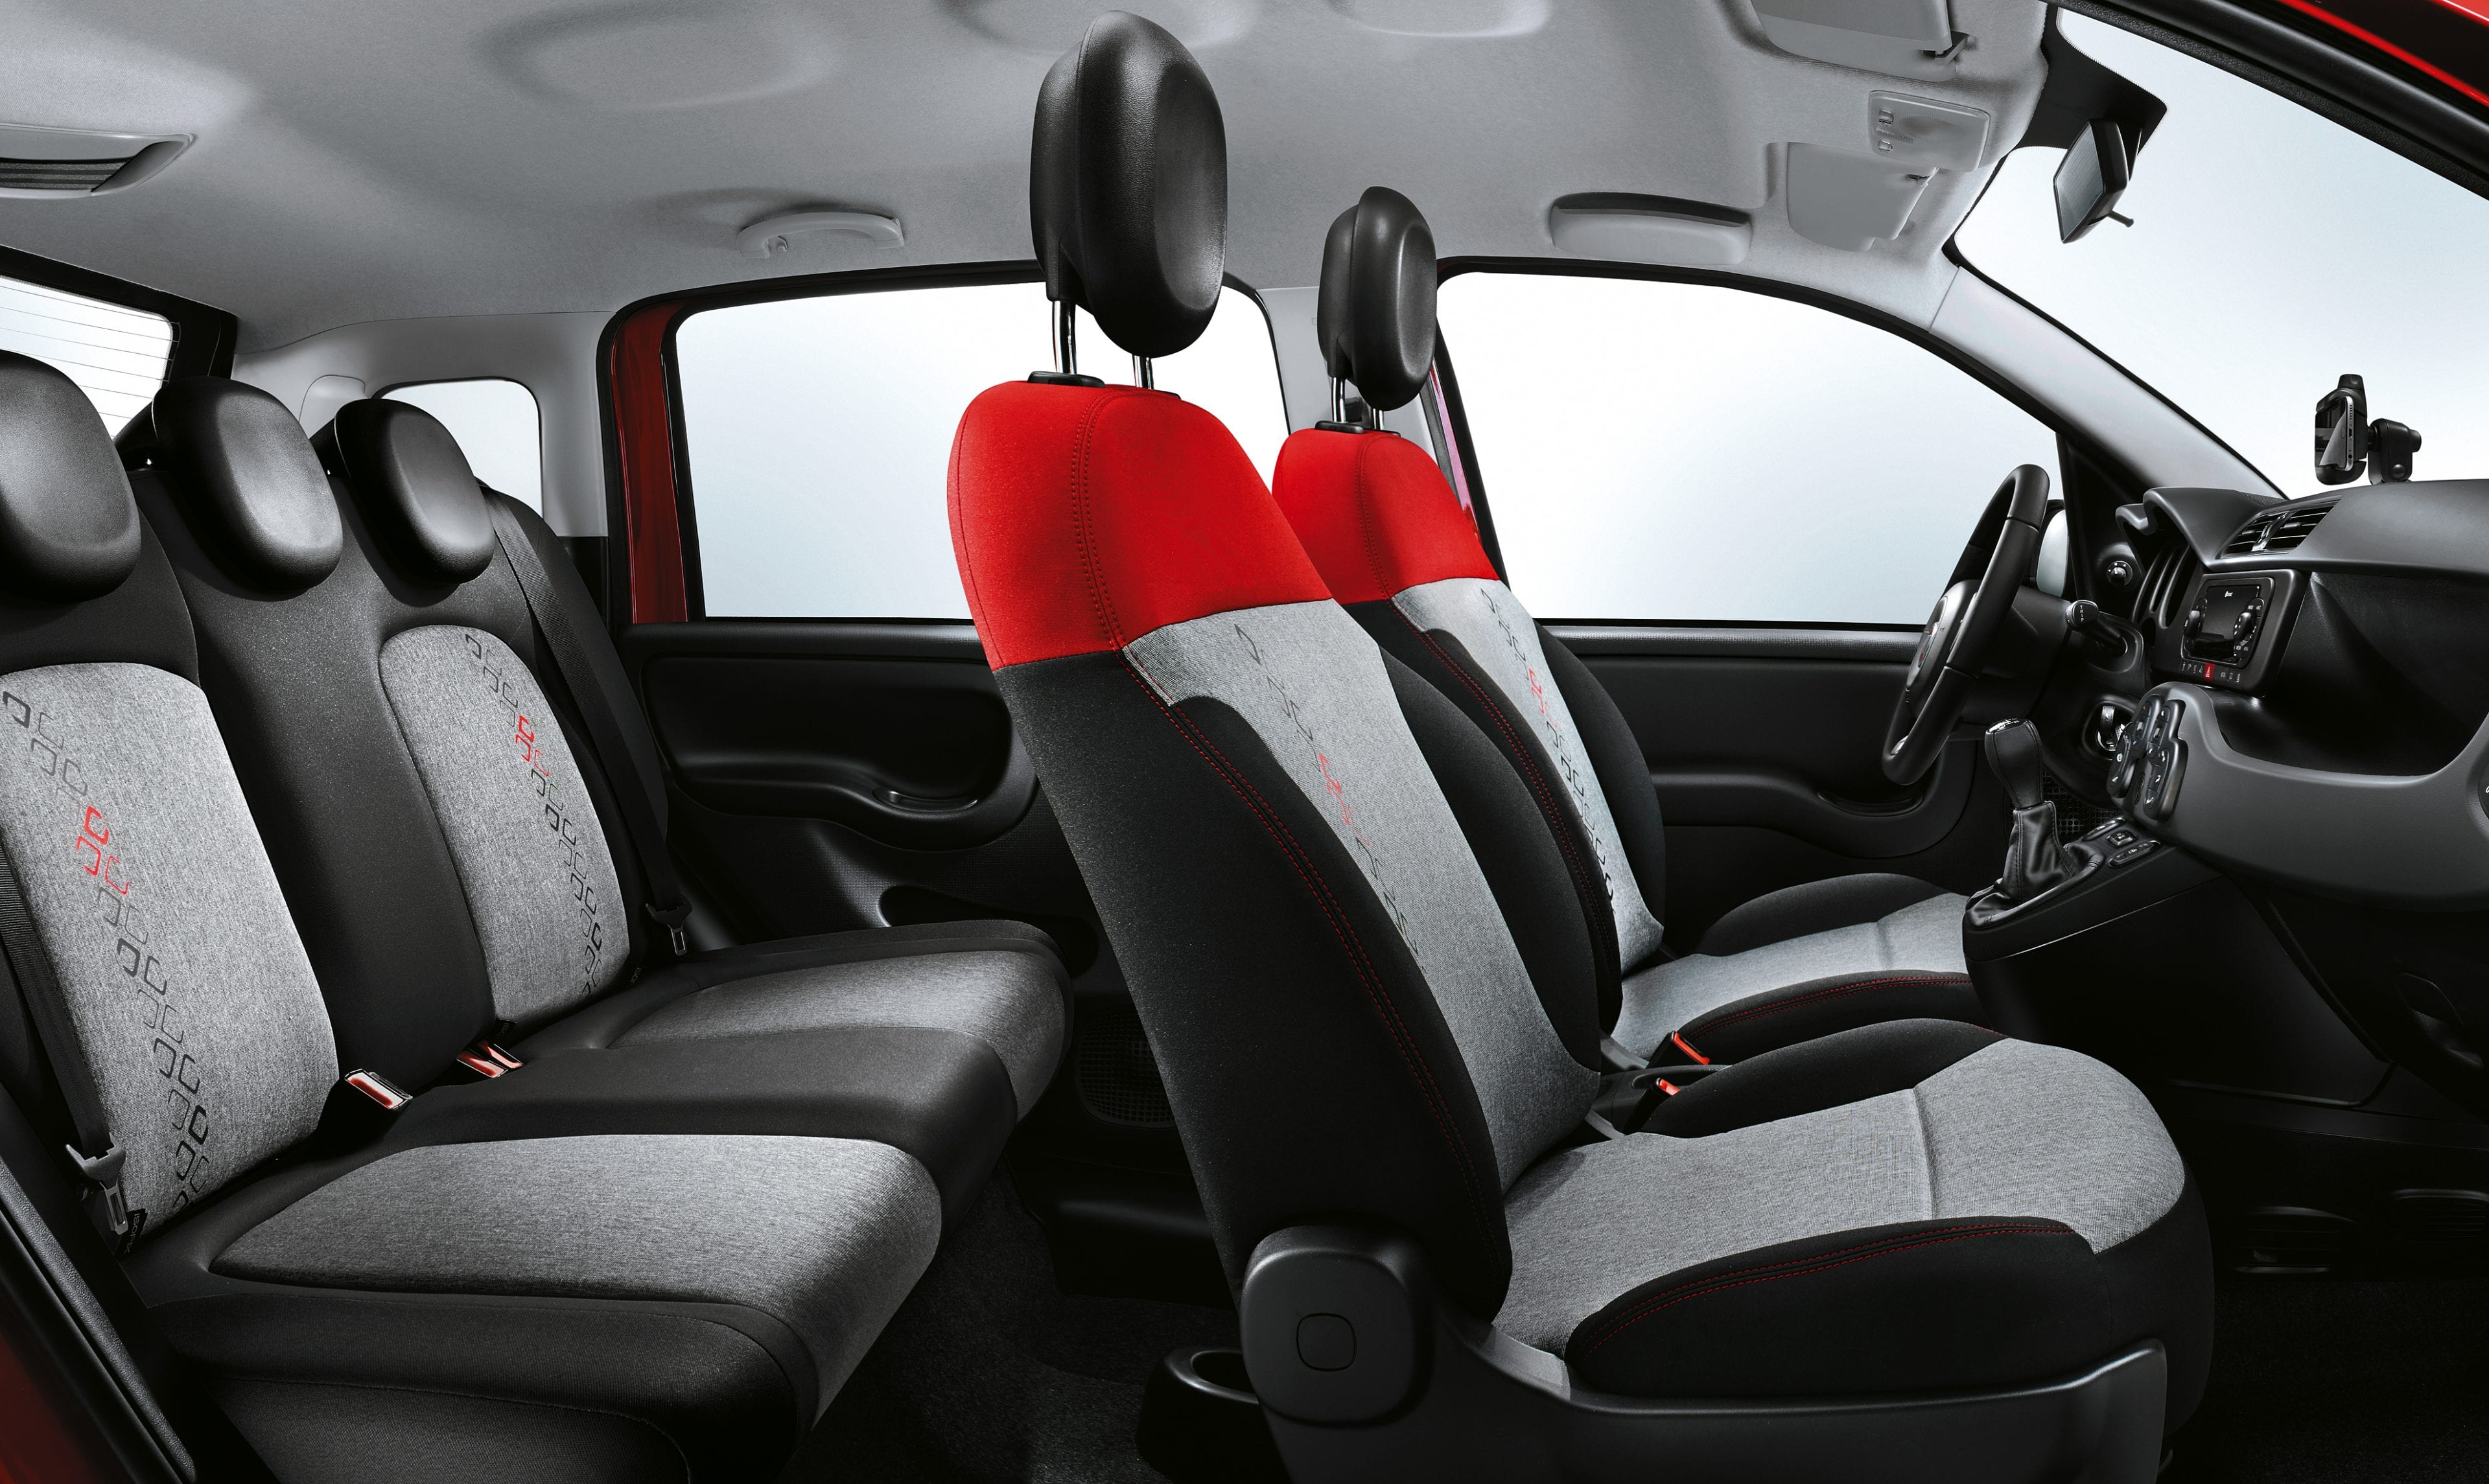 Fiat_Panda interieur grijs-rood